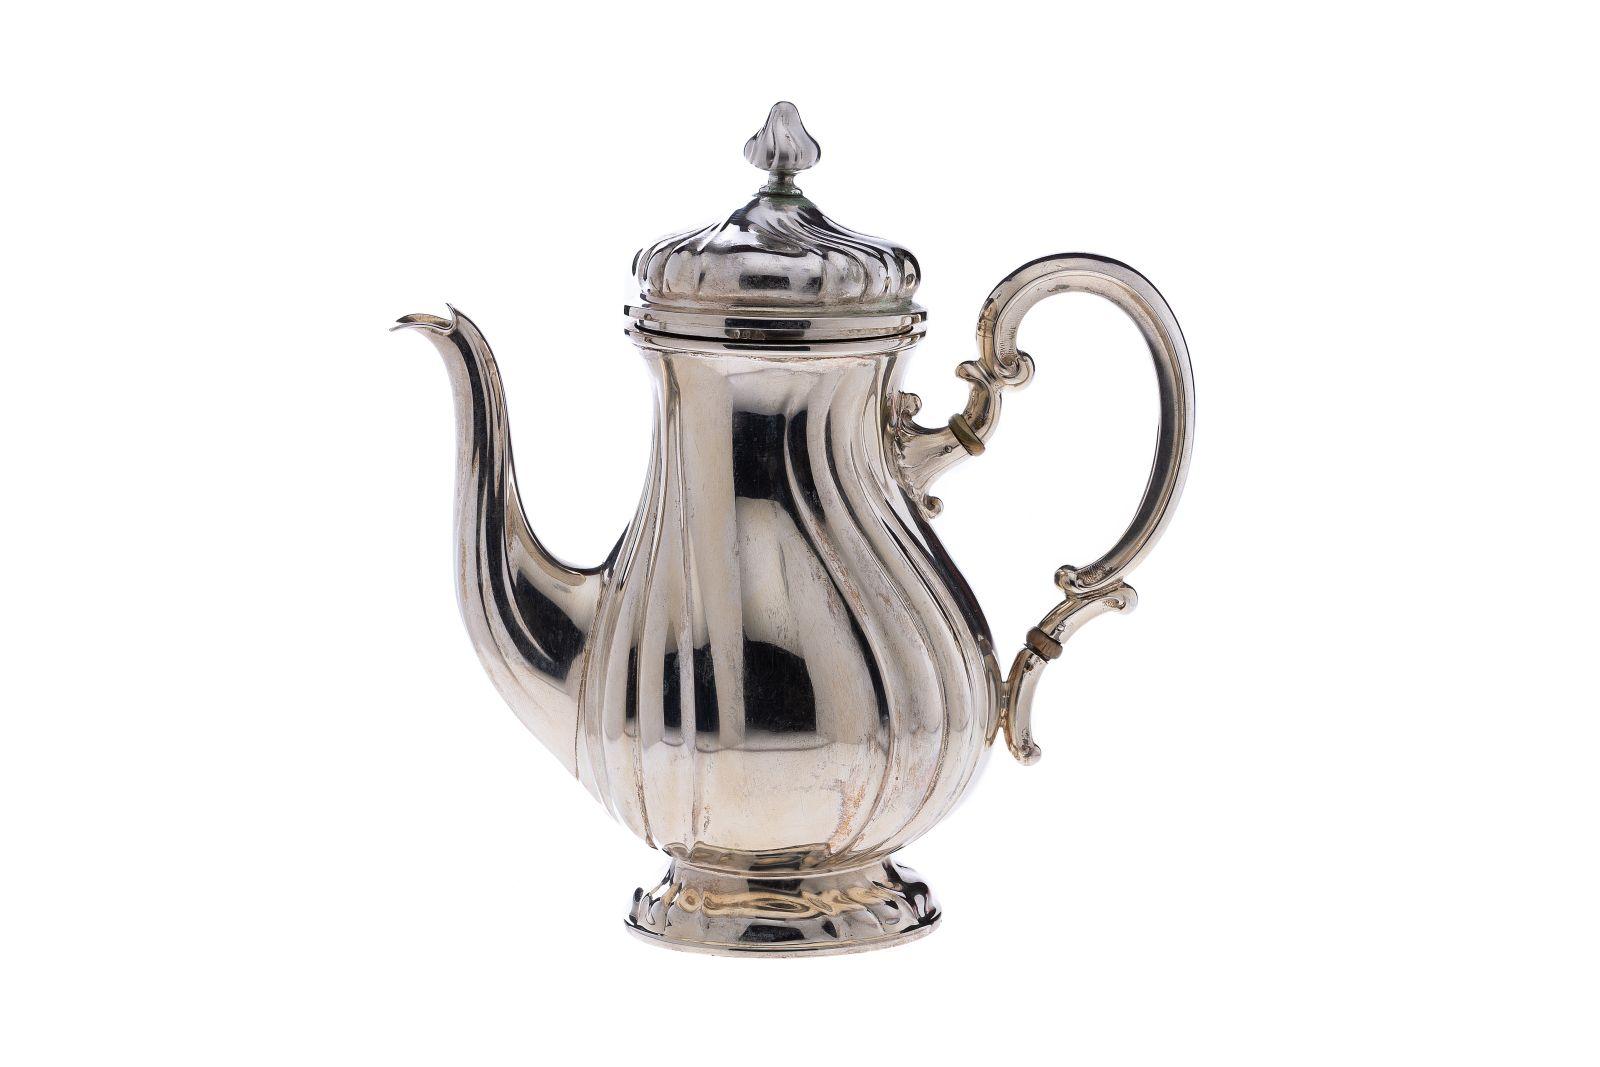 #68 Coffee pot | Kaffekanne Image